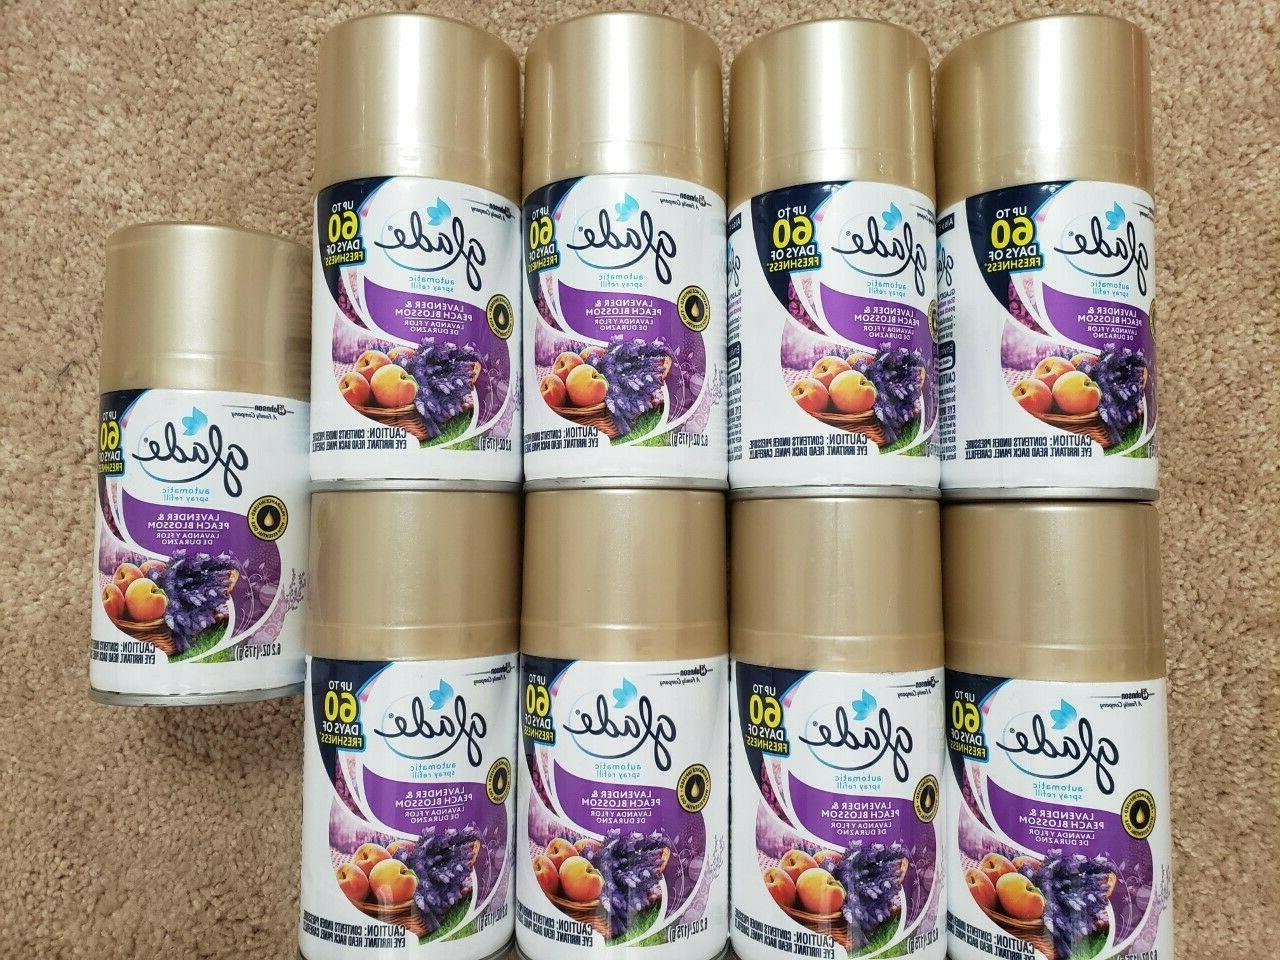 Glade Automatic Spray Air Freshener, Lavender and Peach Blos